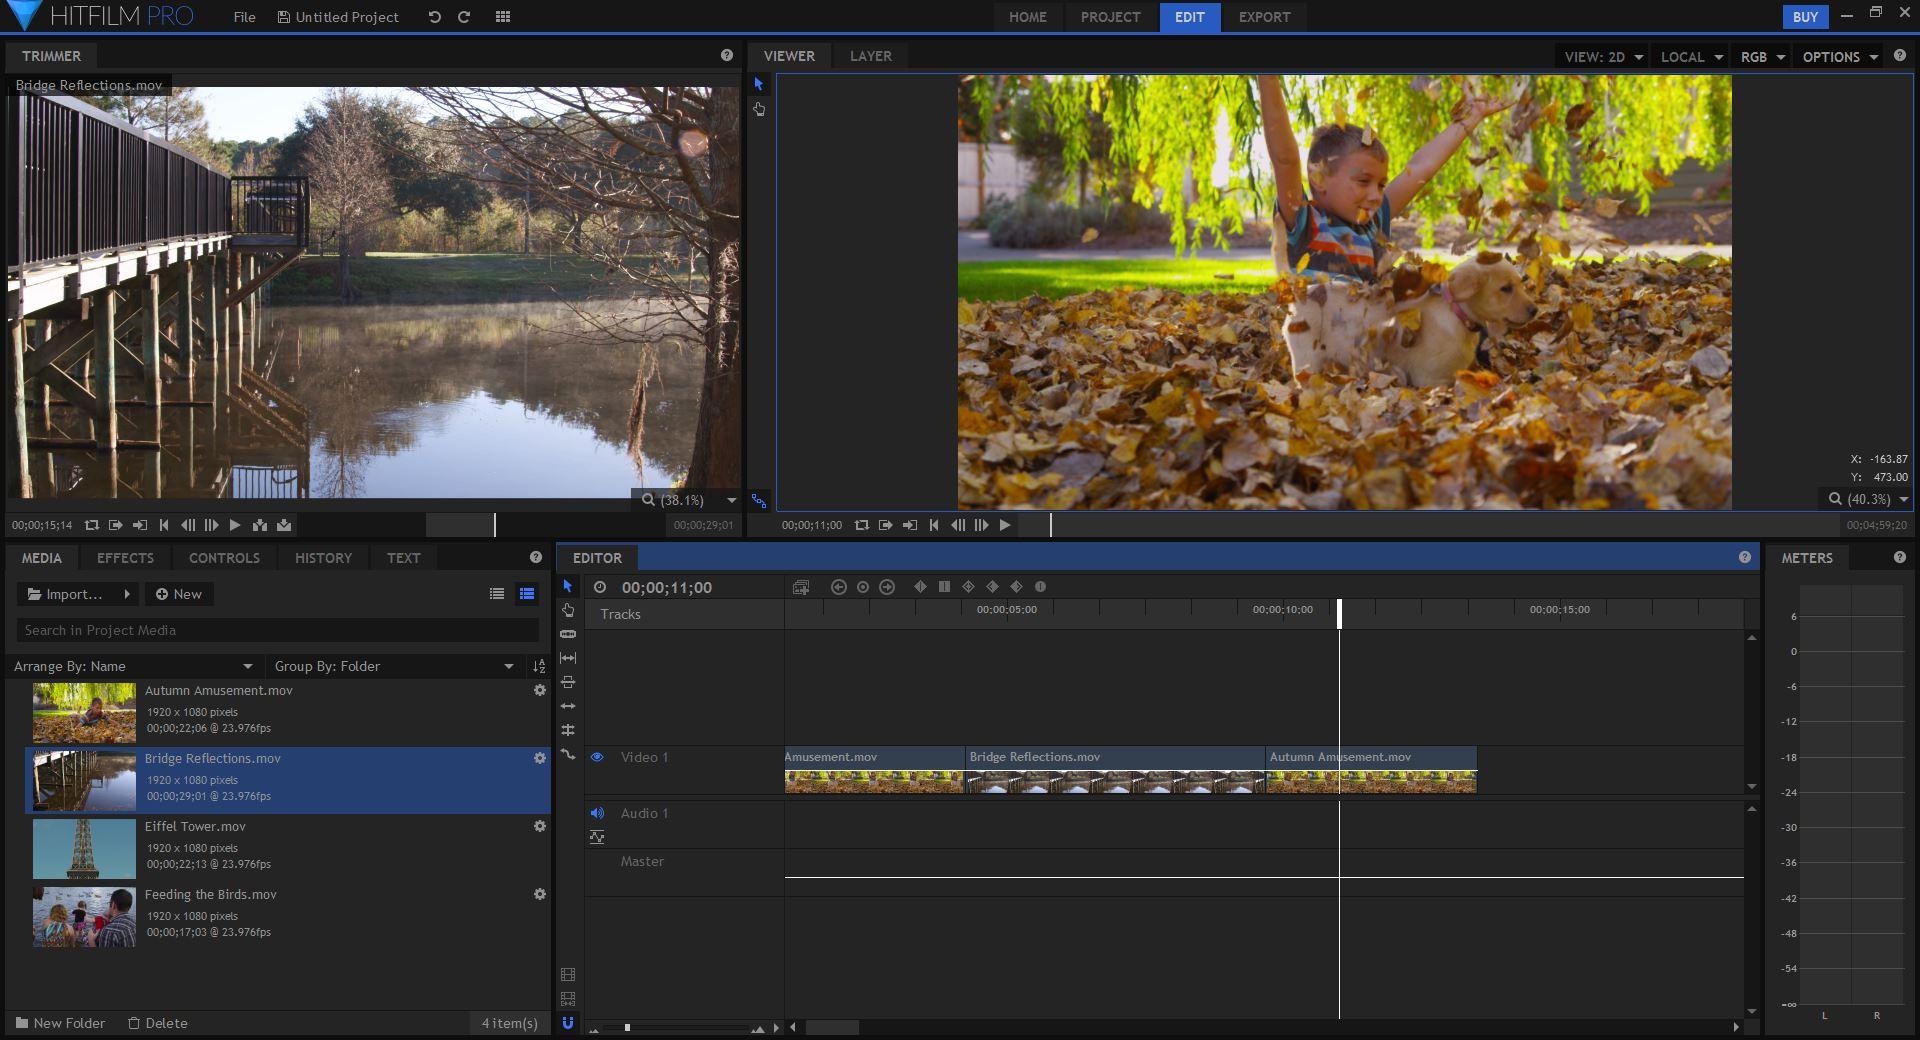 HitFilm Pro Editing Interface